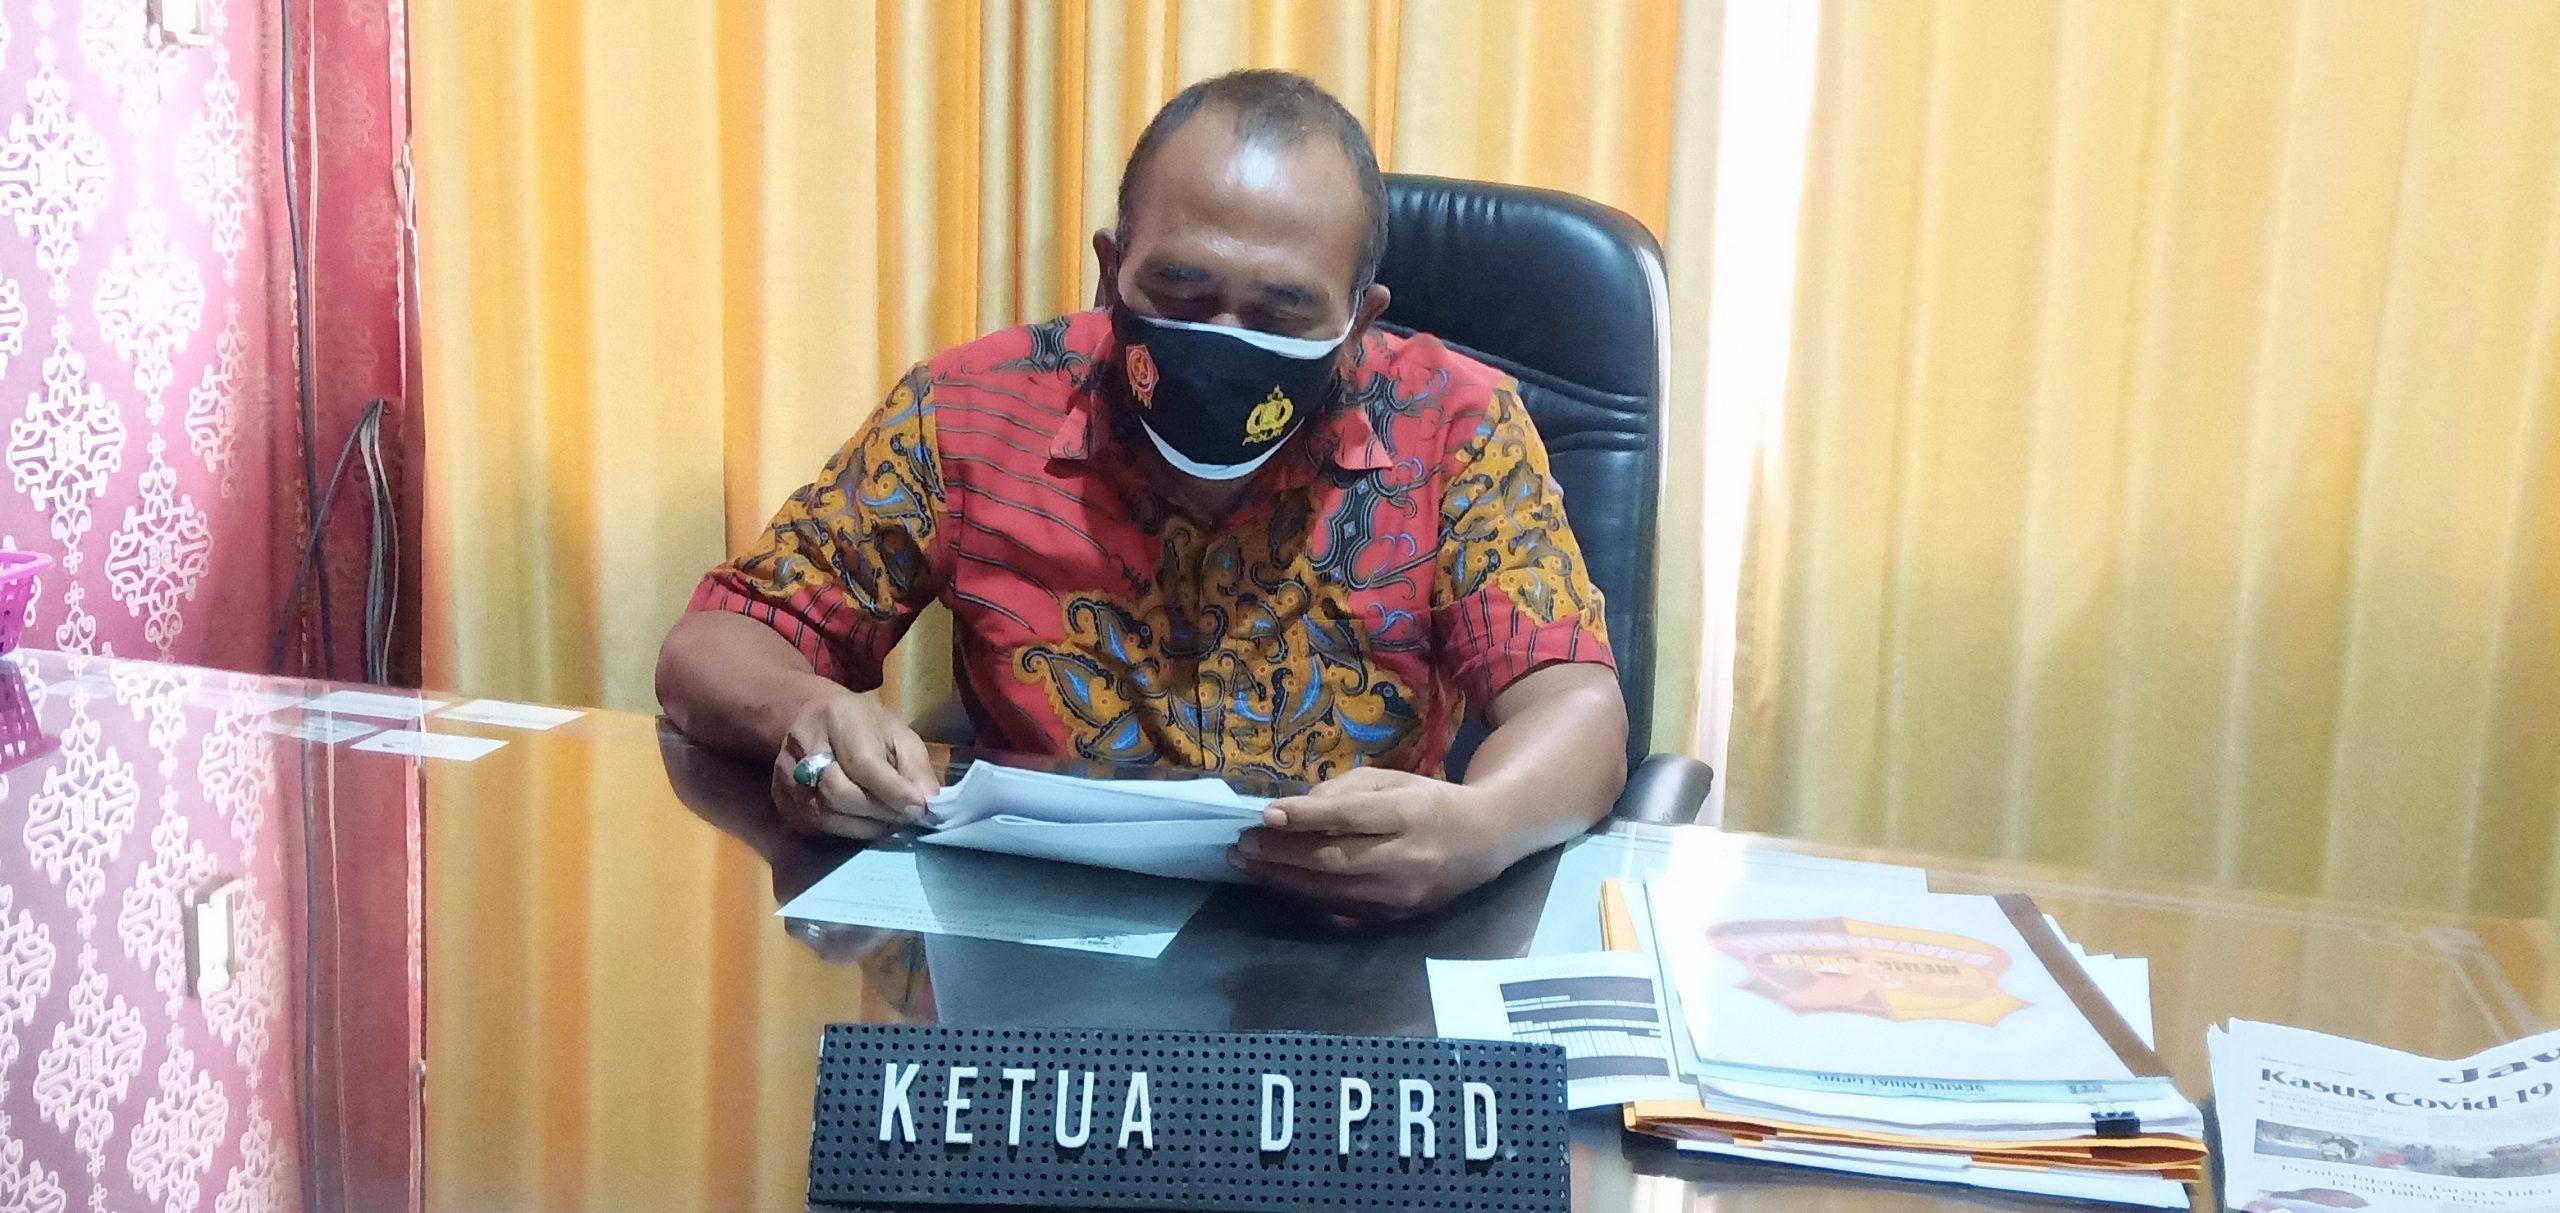 Darurat Covid-19, Ketua DPRD Kota Mojokerto Instruksikan Anggotanya Turut Tangani Covid di Dapilnya